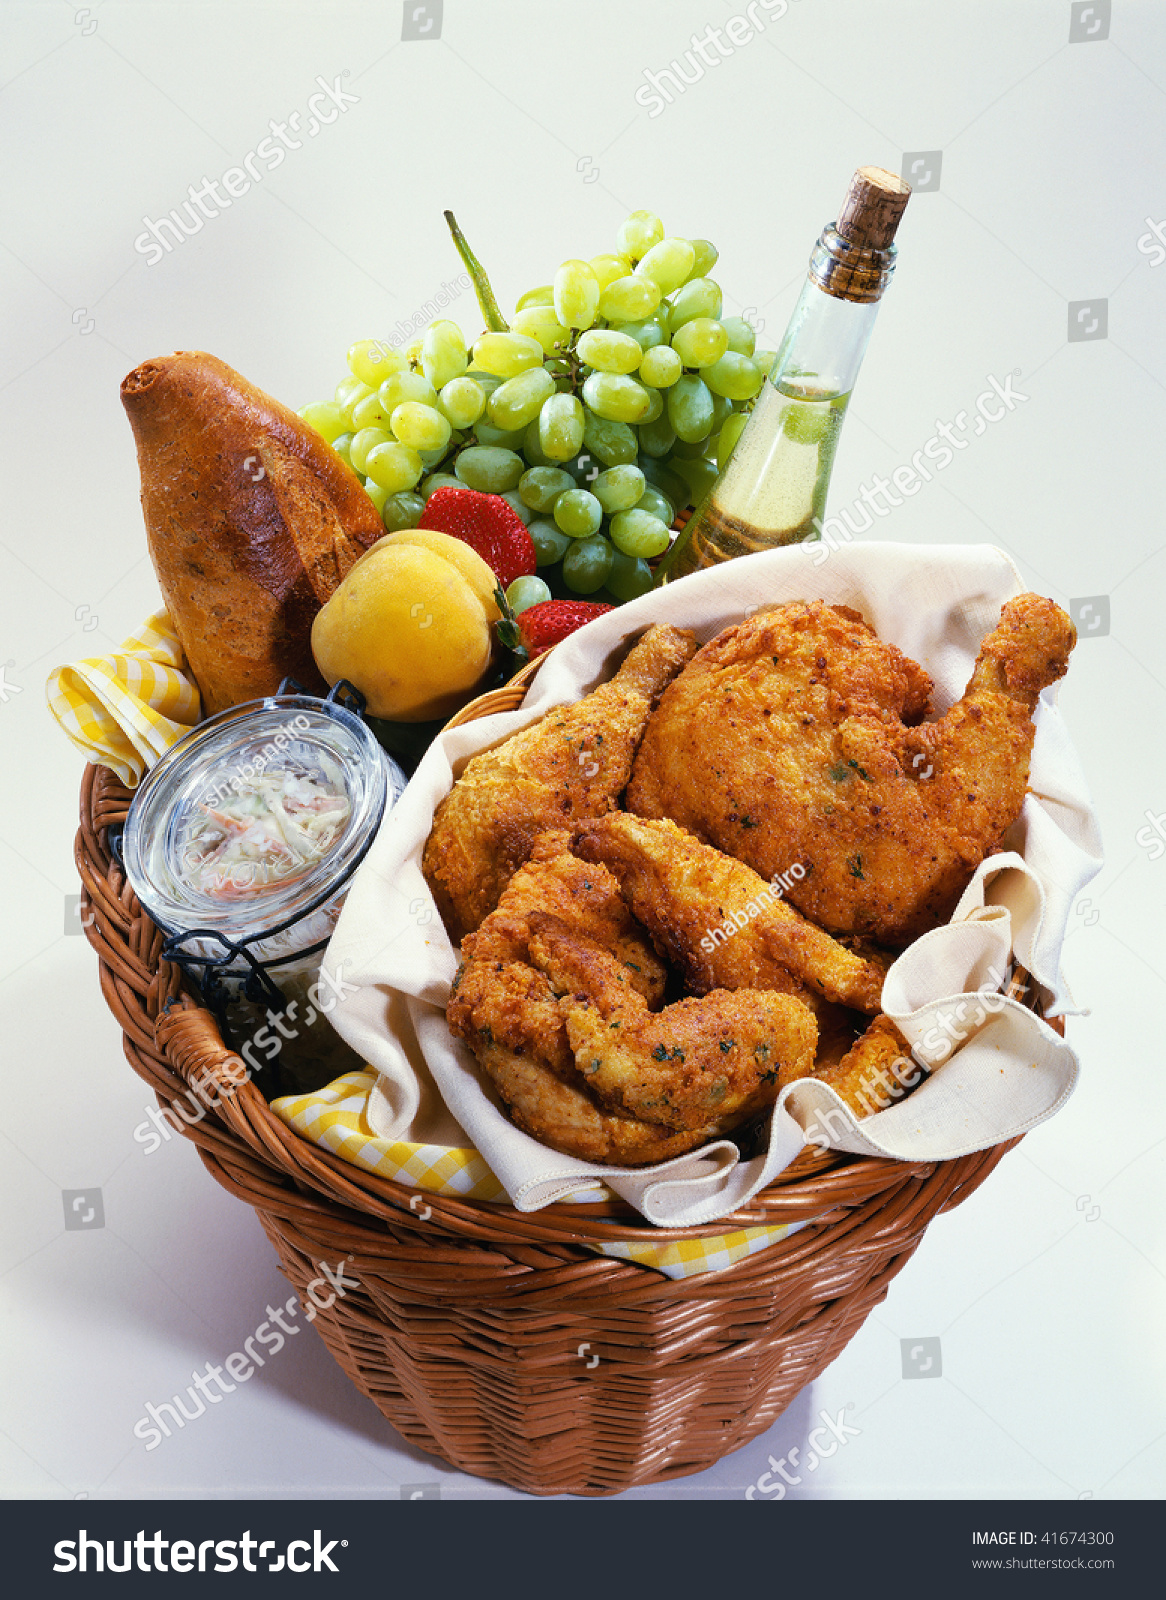 Picnic Basket Food : Picnic basket full fresh food stock photo